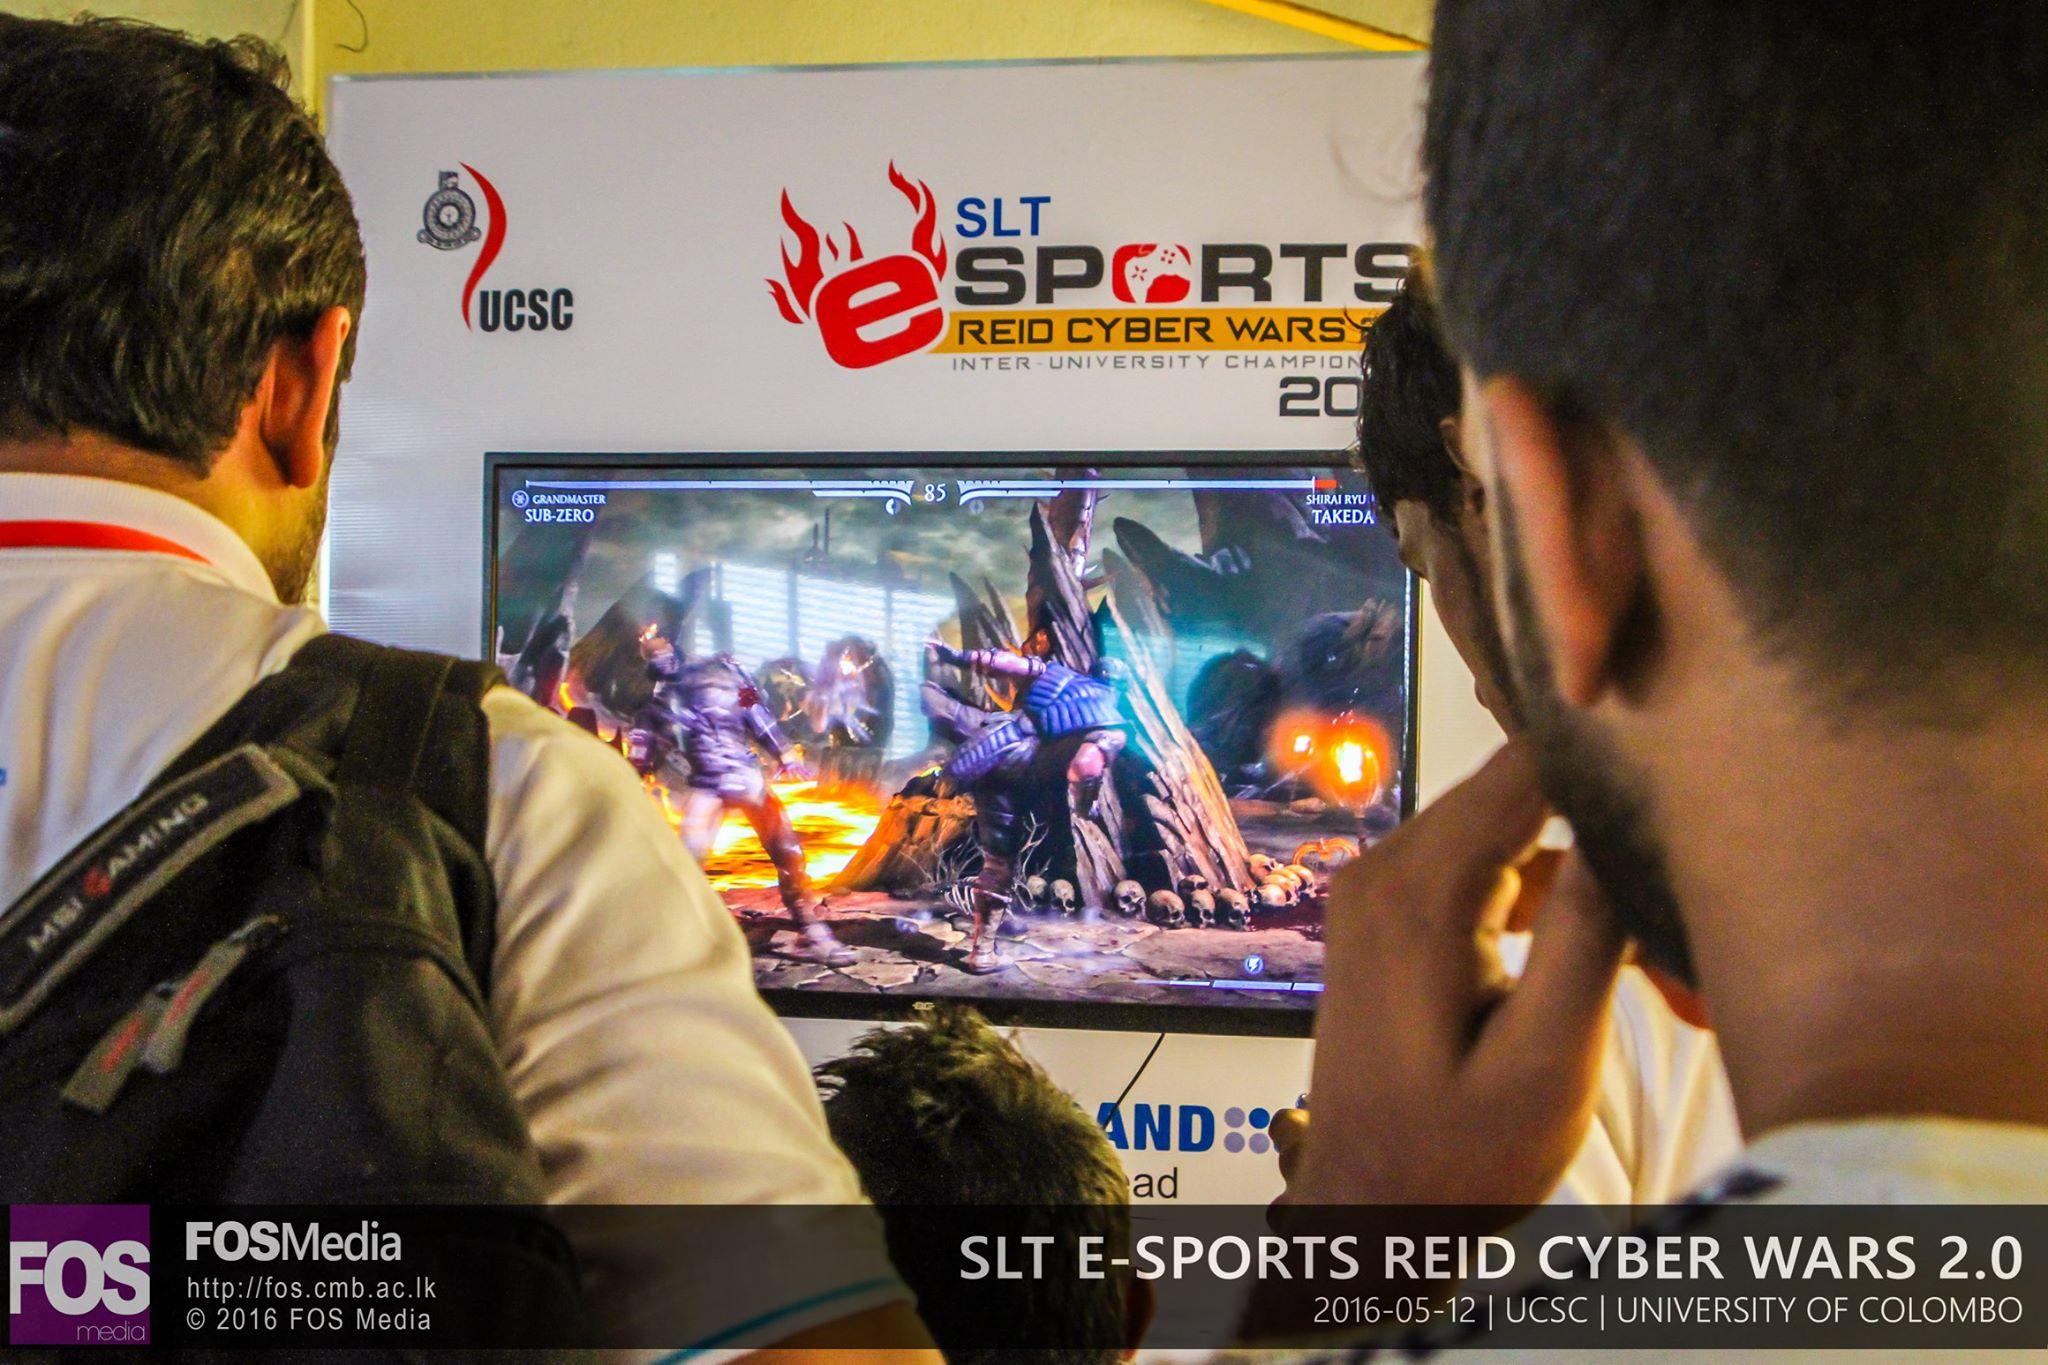 SLT e-Sports Reid Cyber Wars 2.0